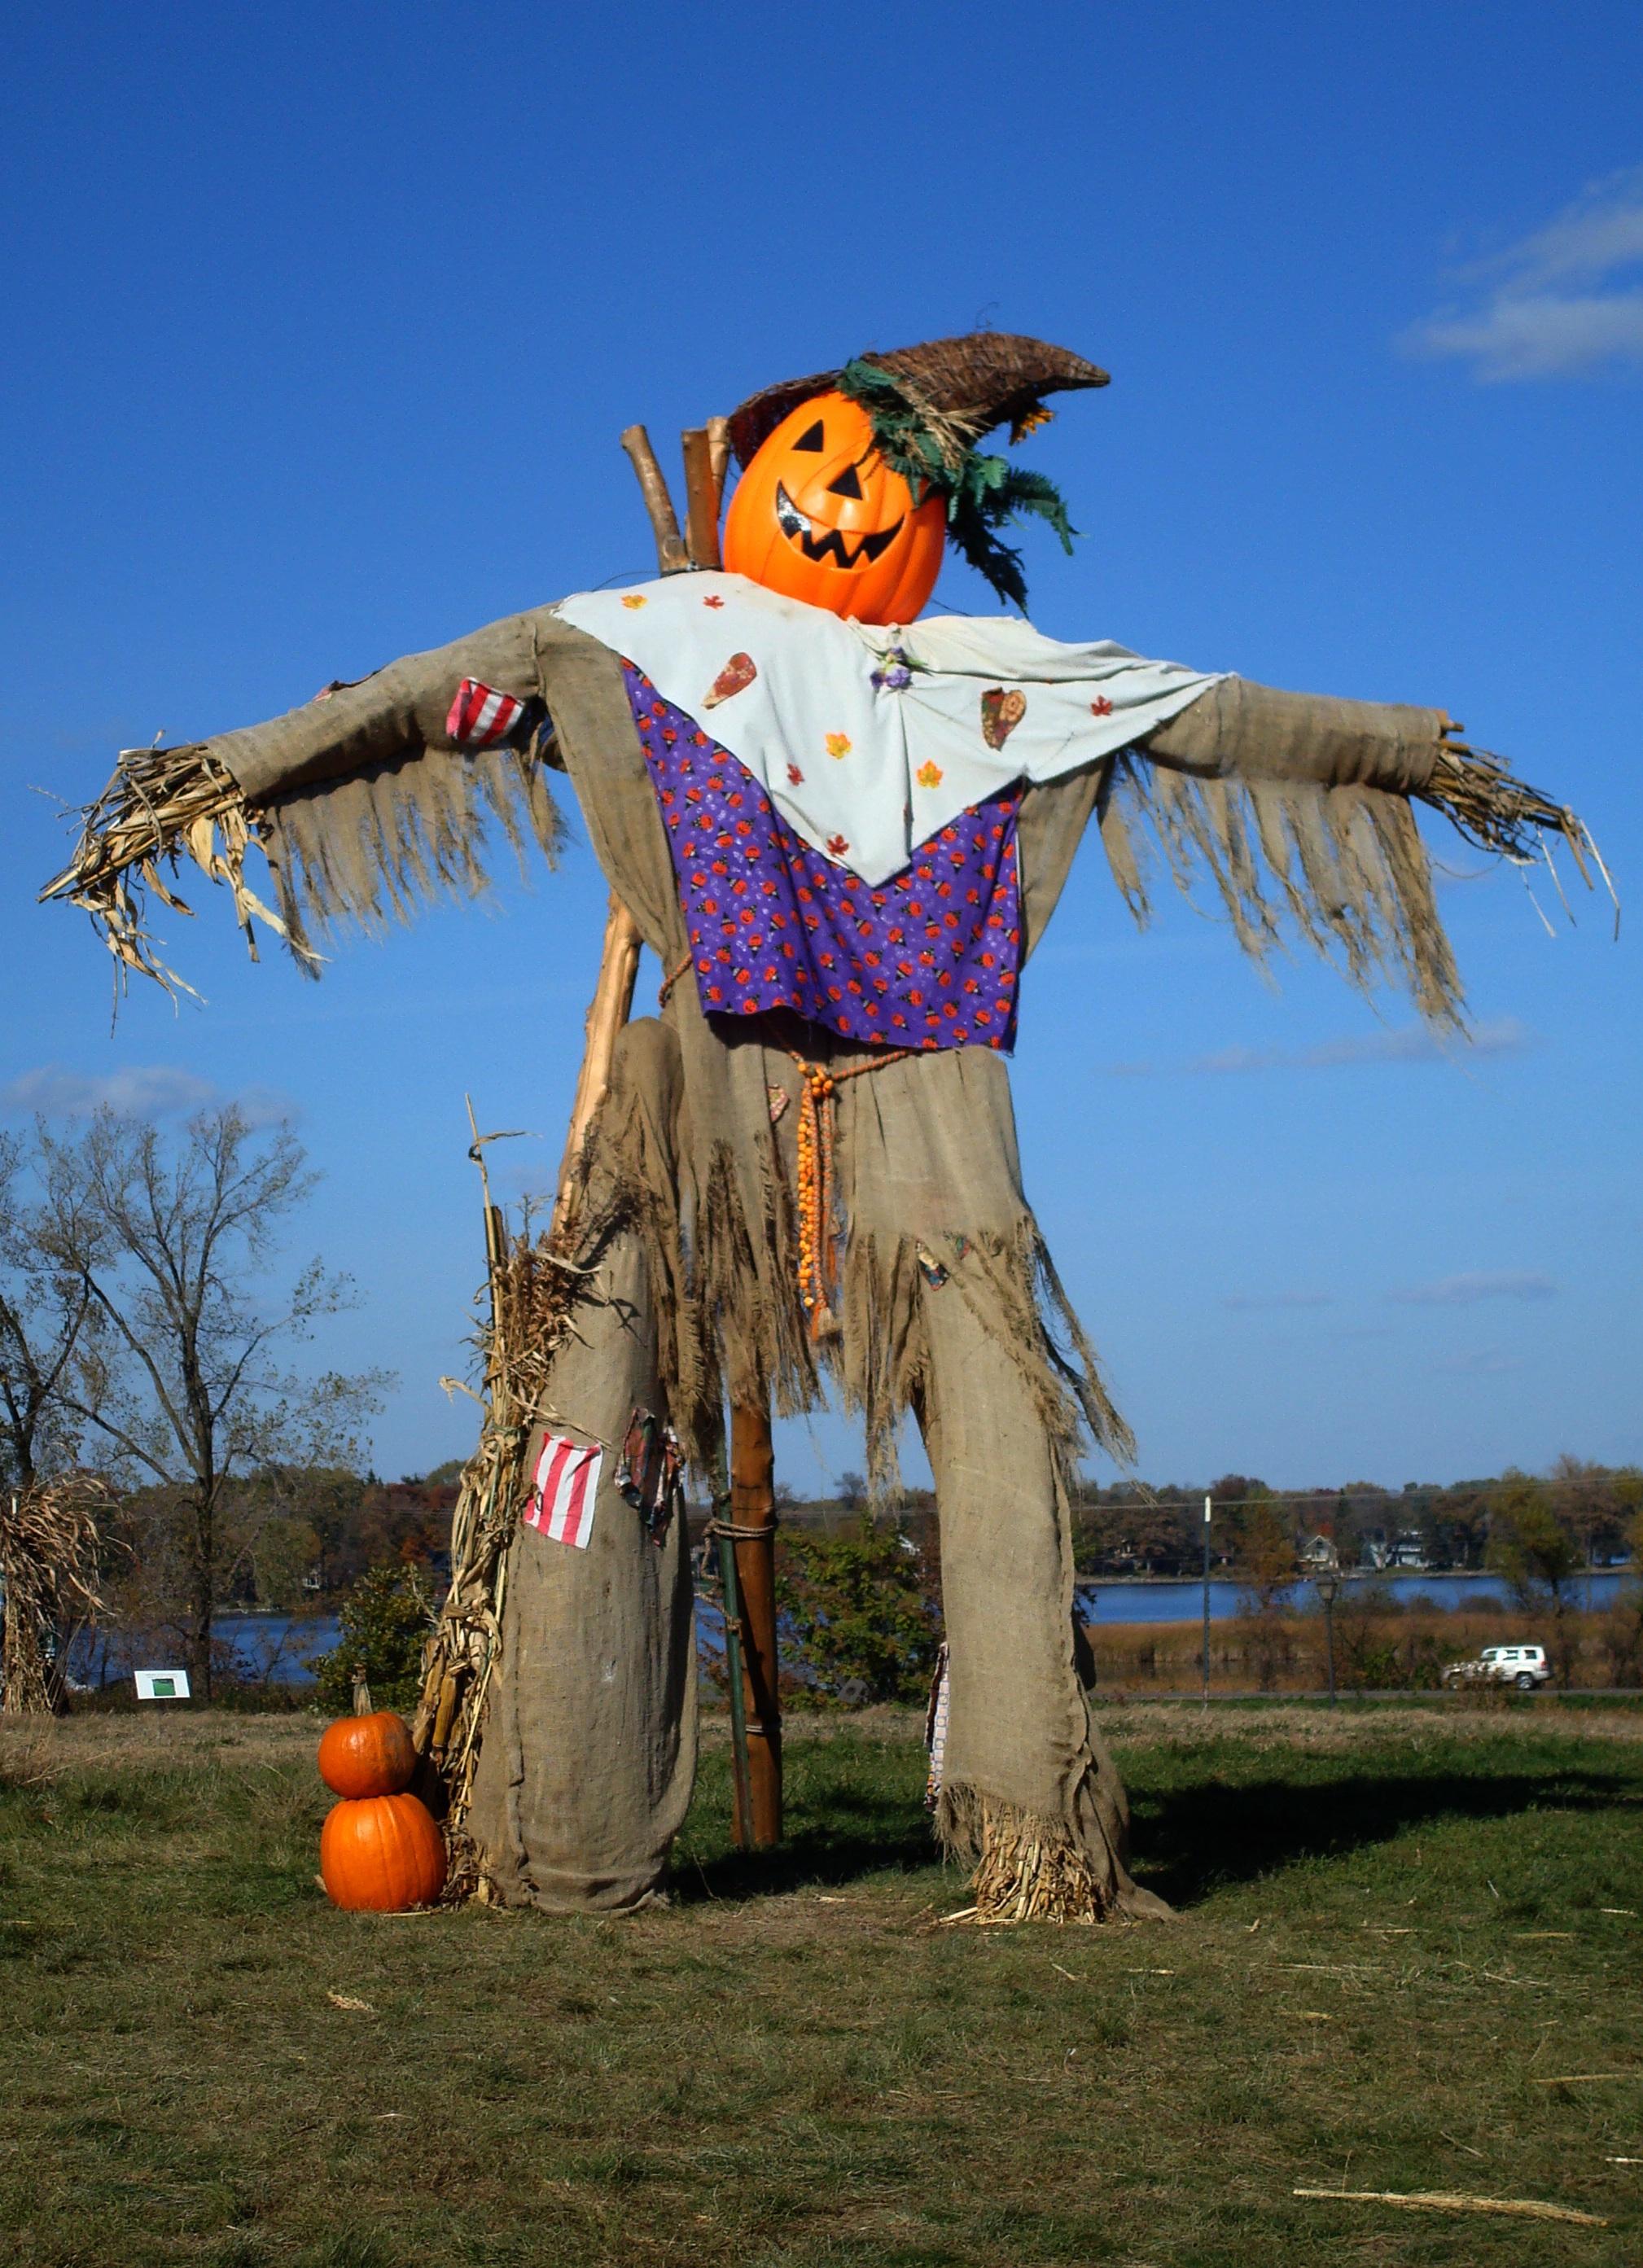 free images fall statue harvest autumn pumpkin halloween